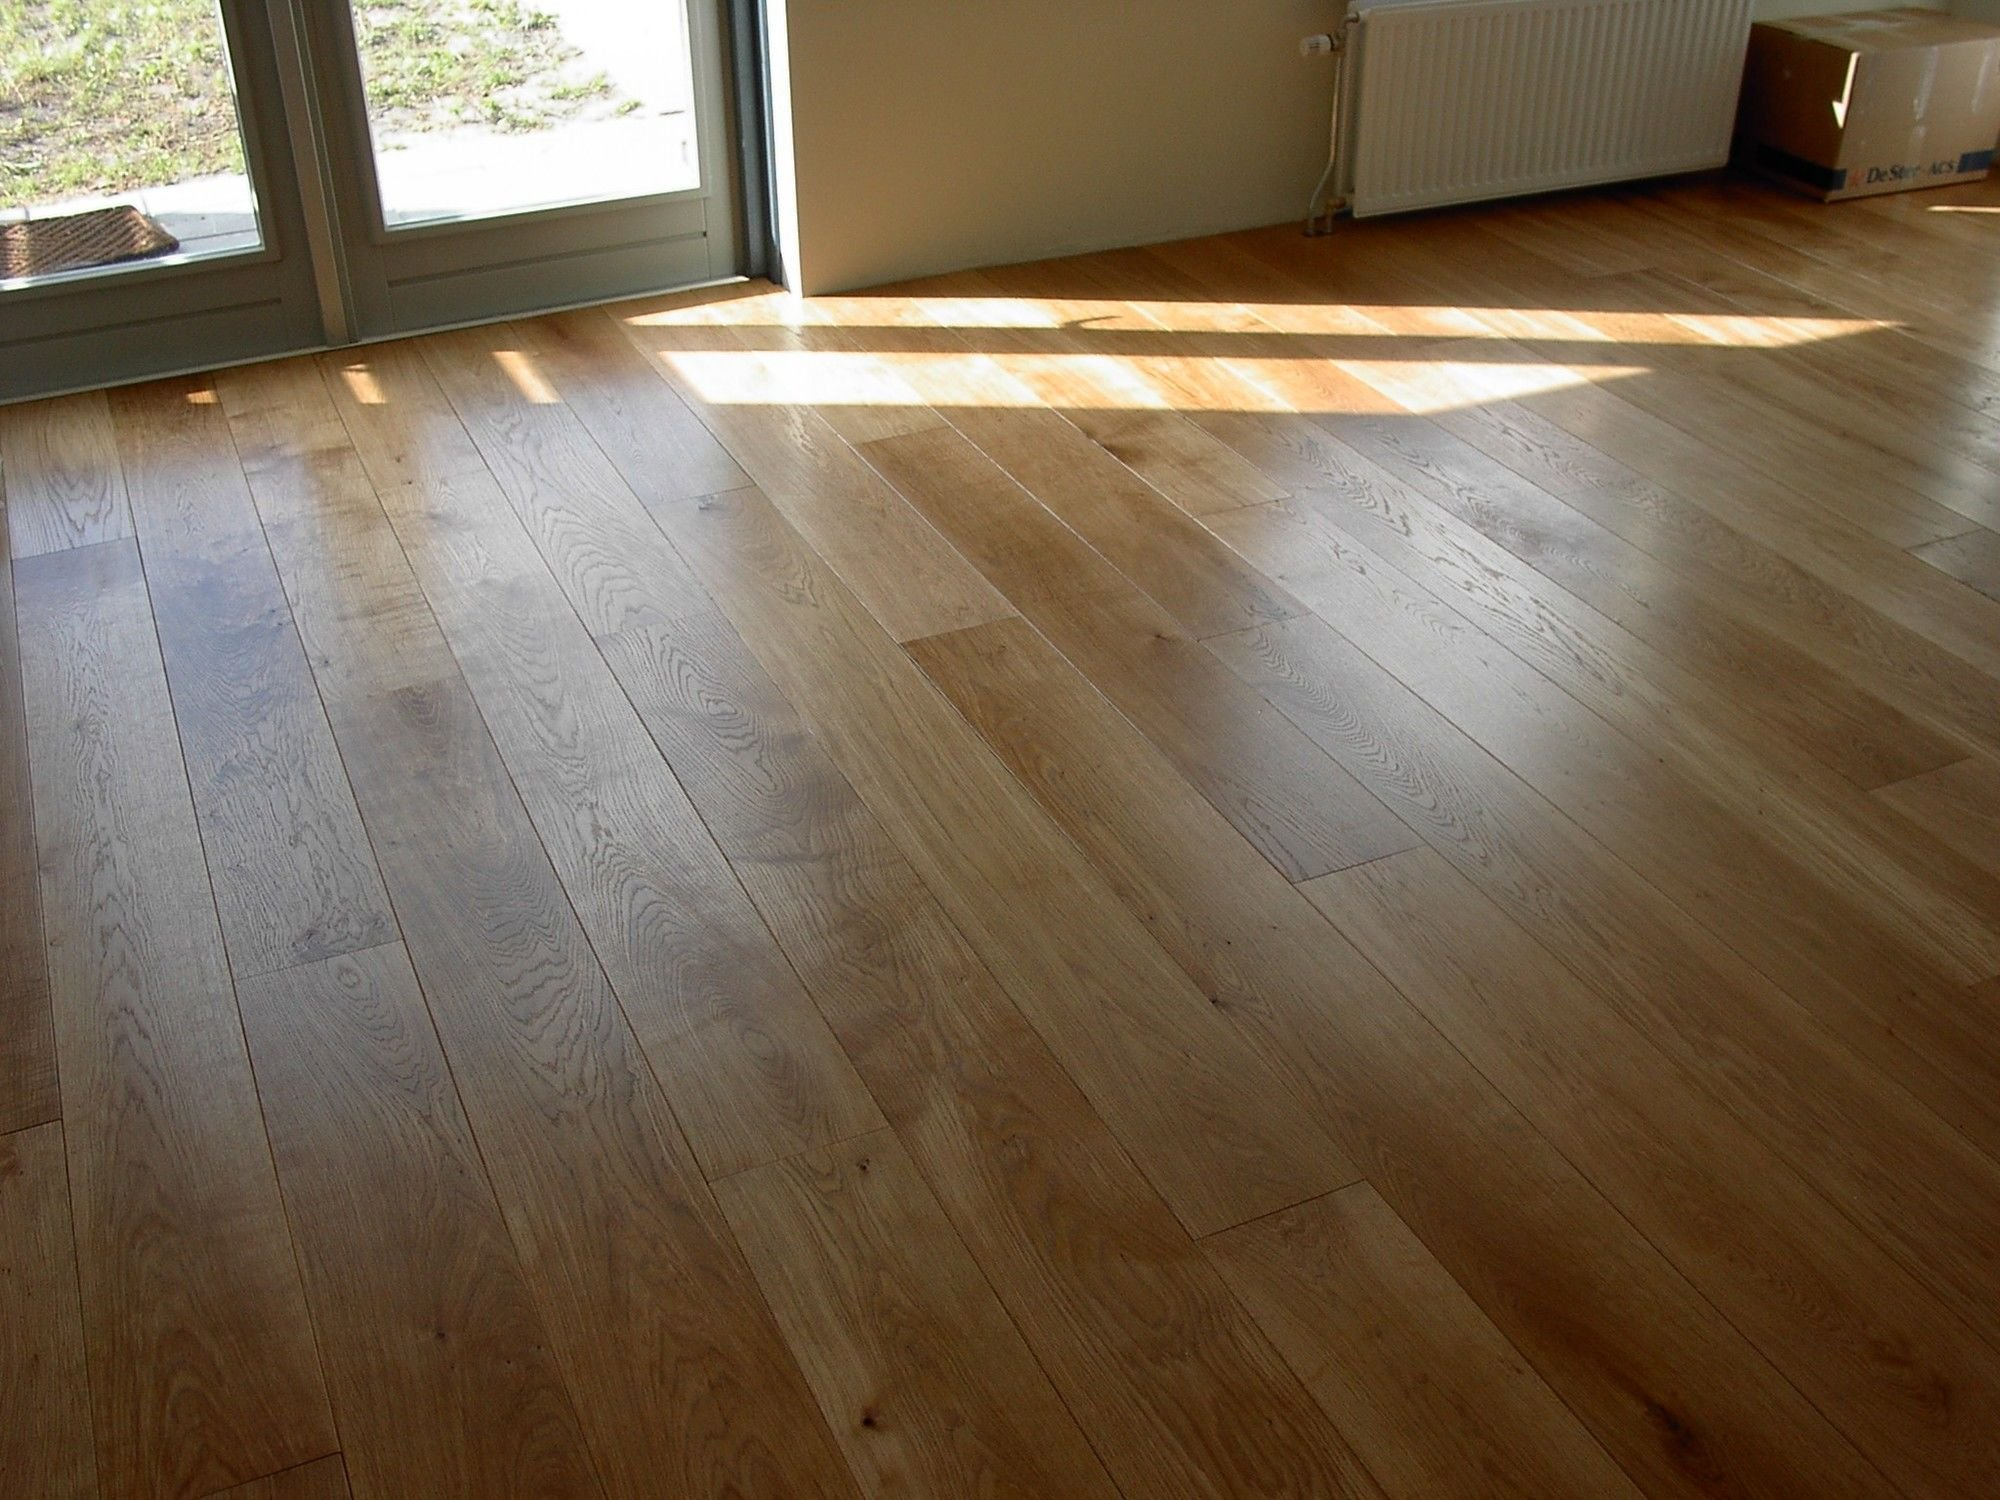 restpartij houten vloer 60m2 eiken rustiek a b 24cm 4mm top kopen